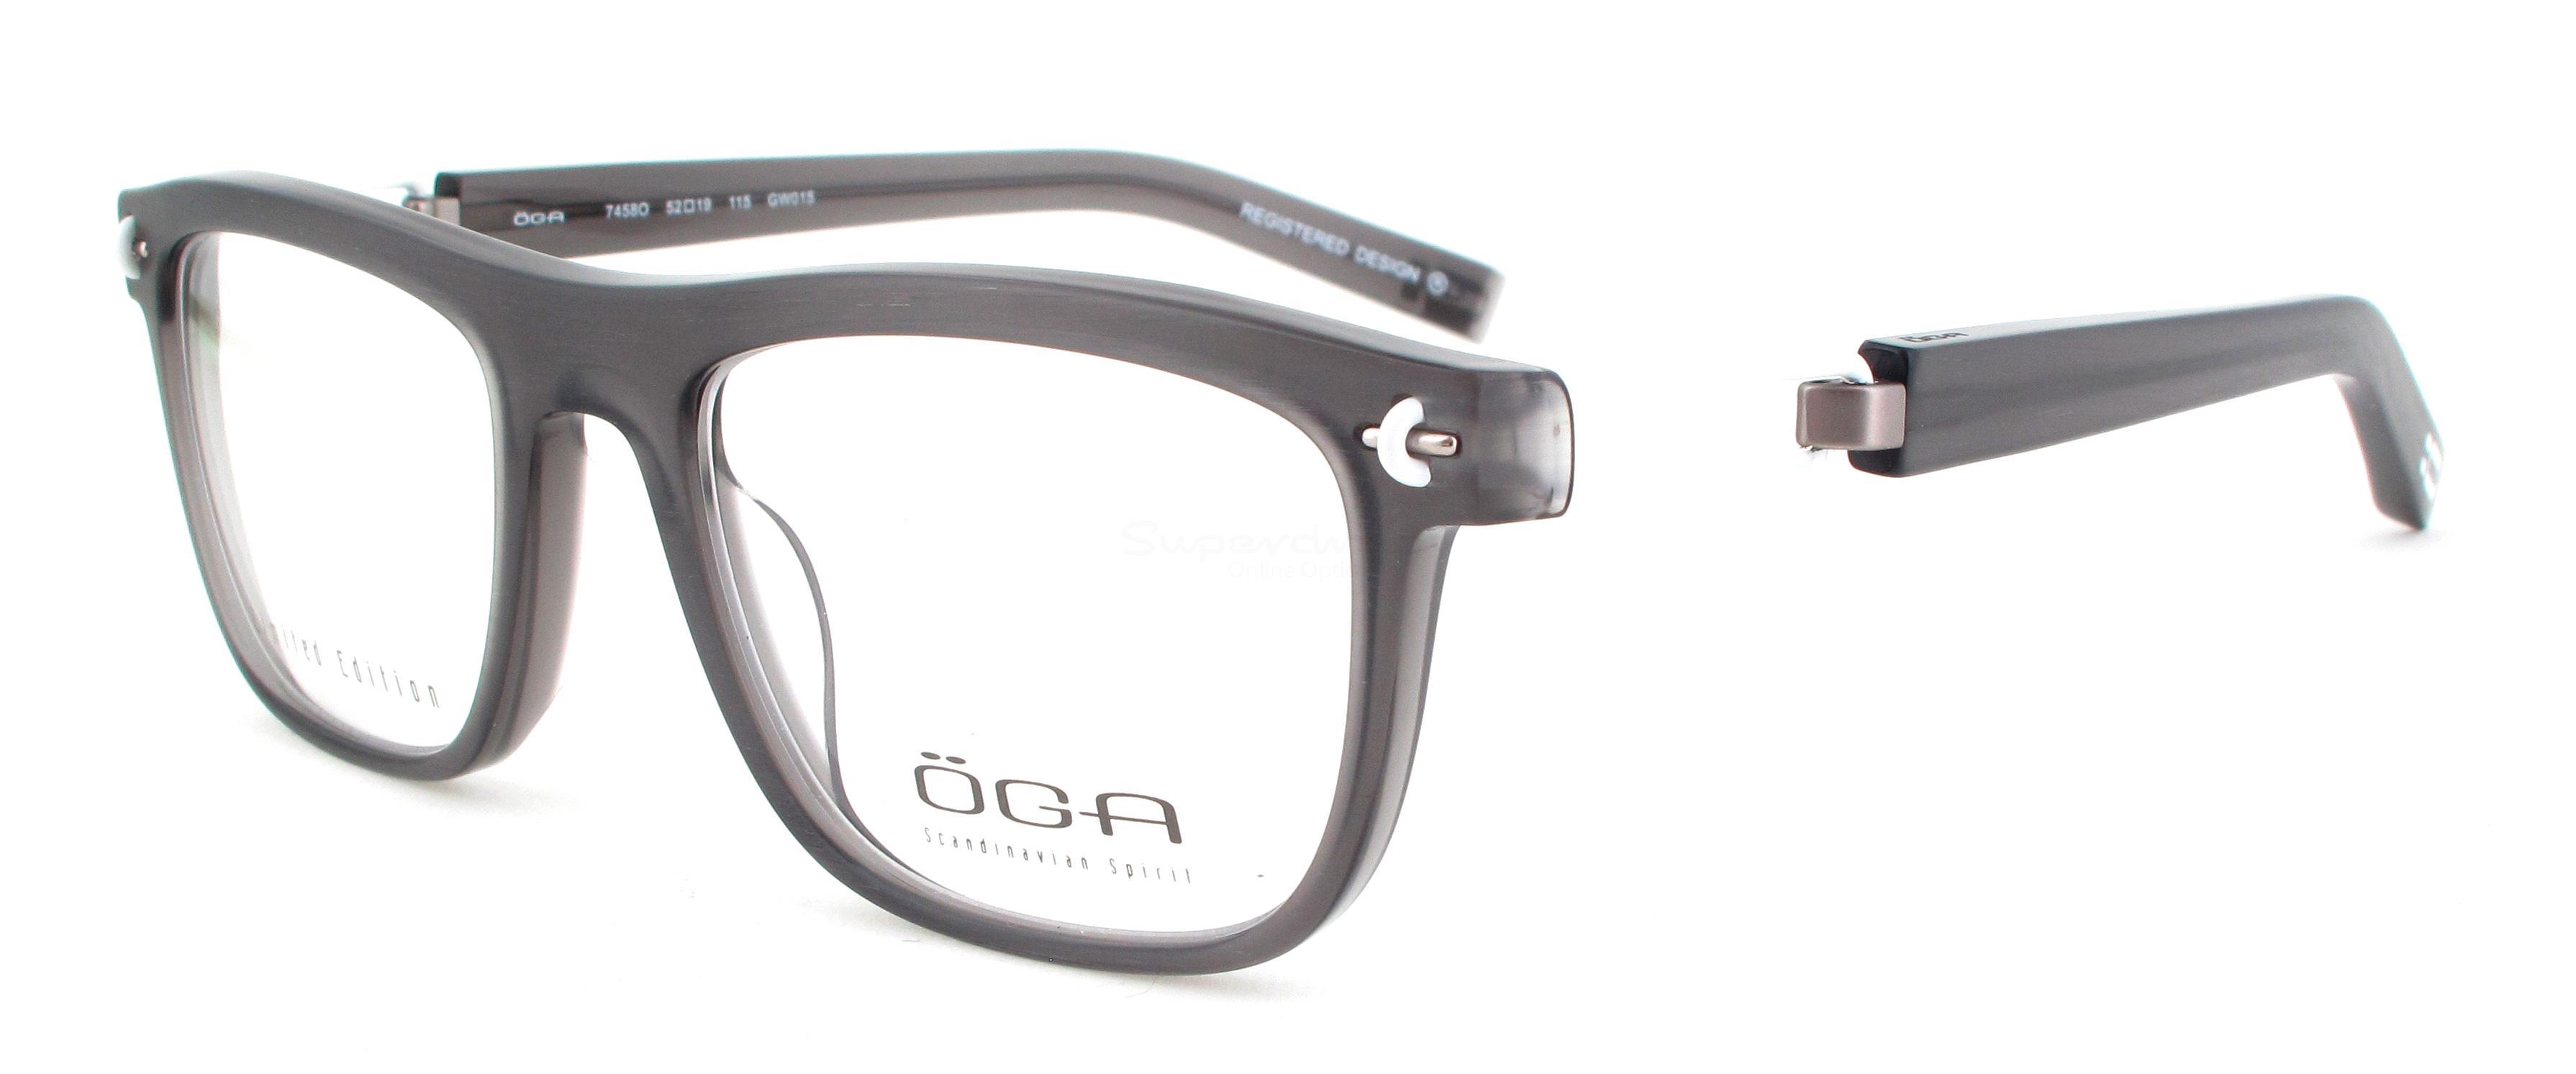 GW015 7458O TRAD 1 Glasses, ÖGA Scandinavian Spirit